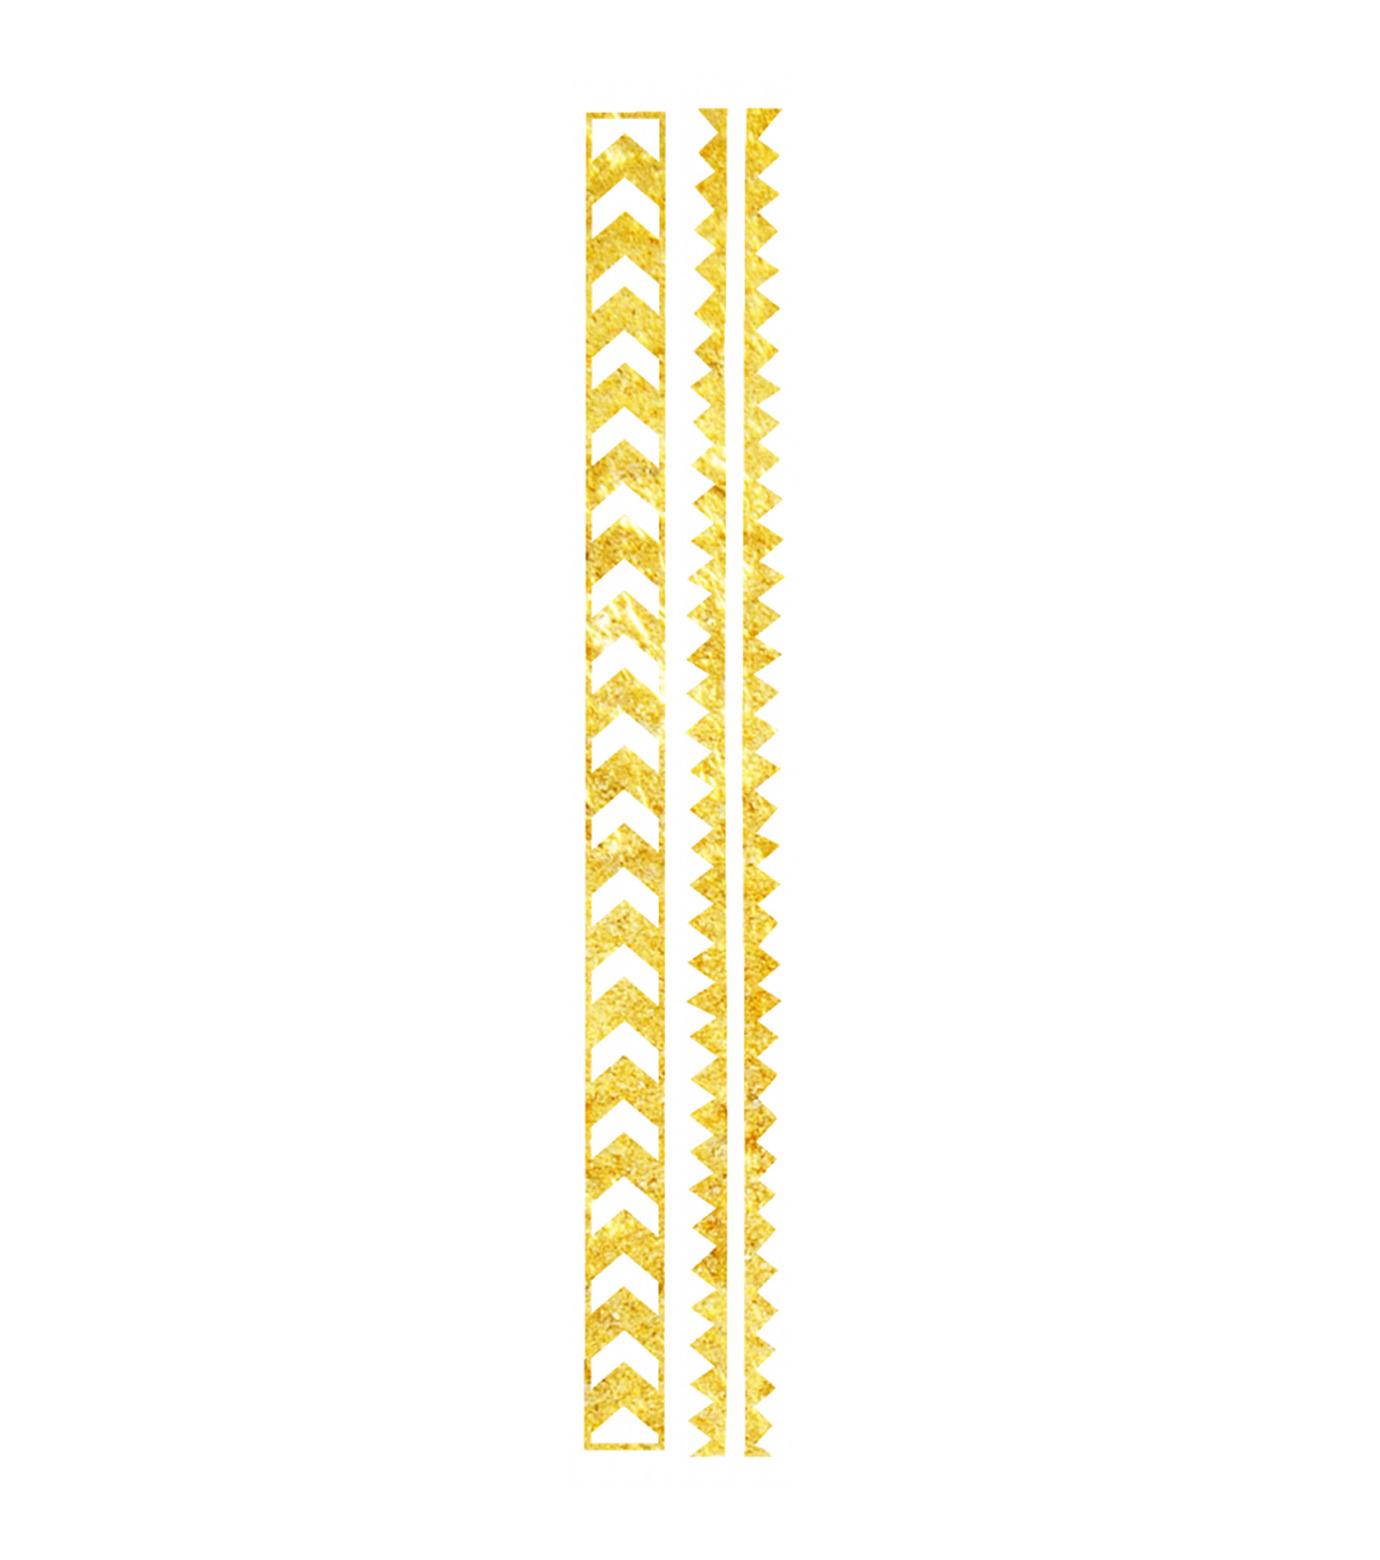 DCER(ディーシーイーアール)のGold Arrow Bracelet Tattoo-BLACK(MAKE-UP/MAKE-UP)-SS15014-13 拡大詳細画像1